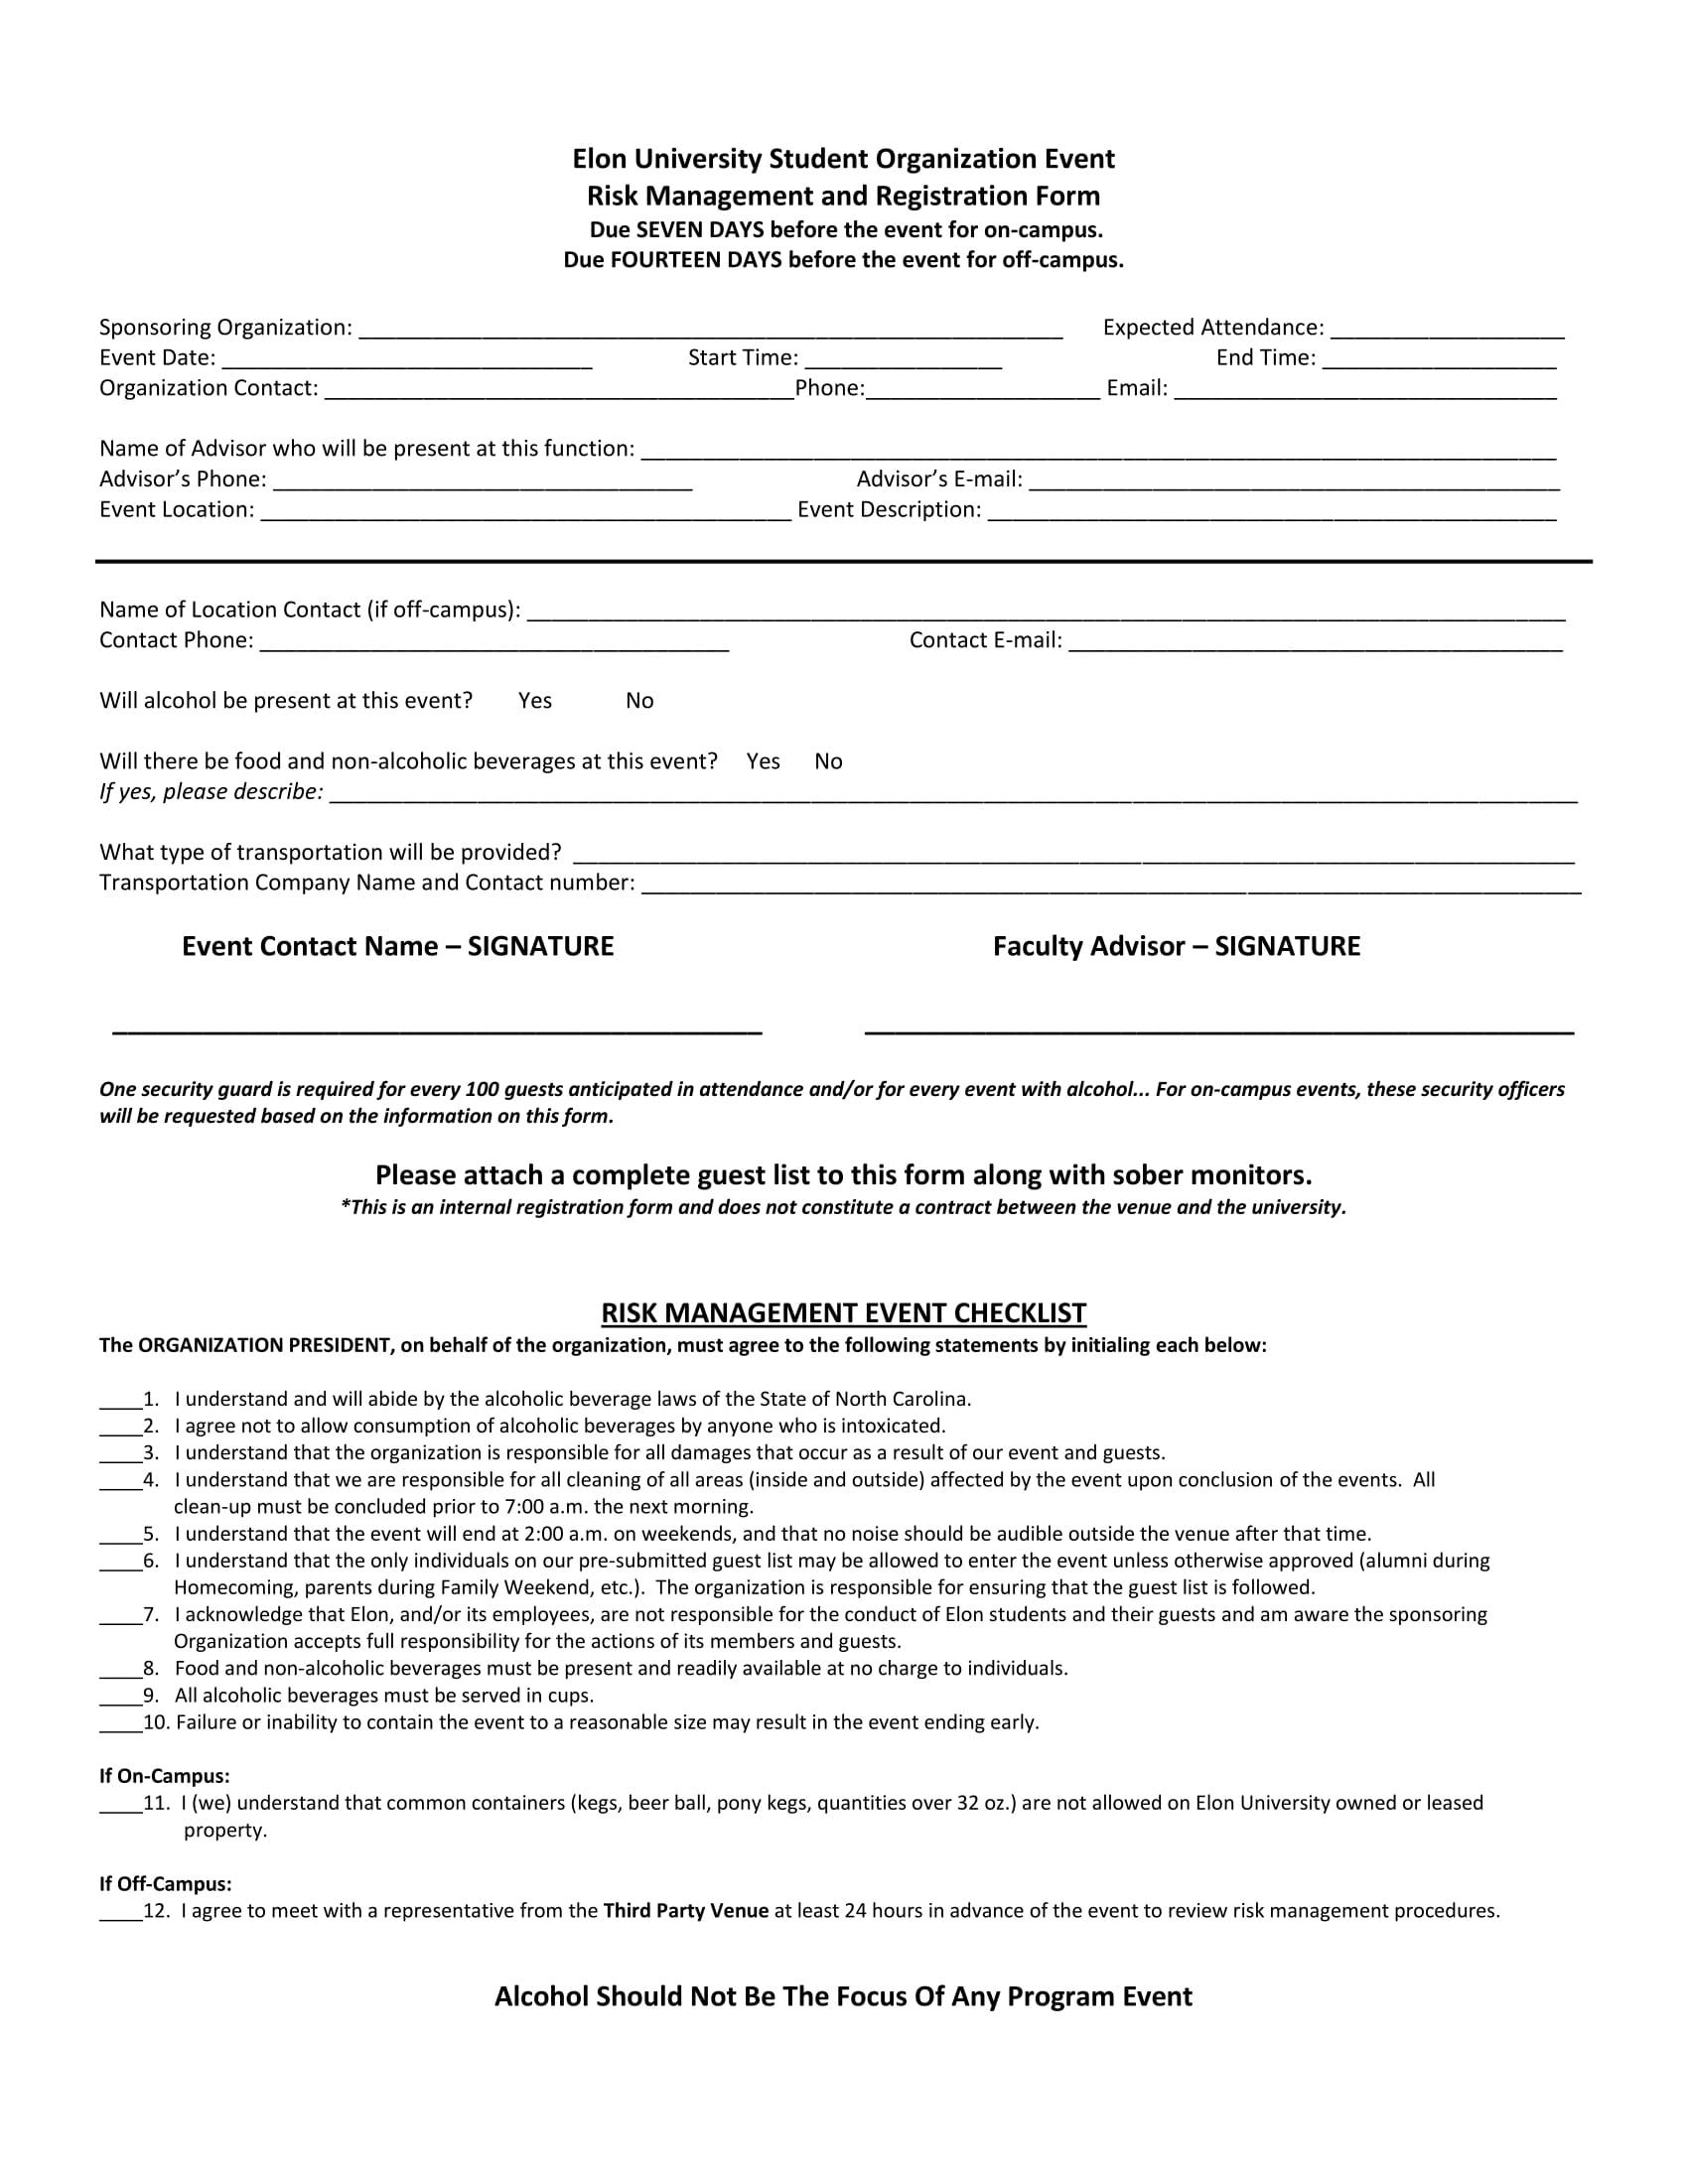 organization event registration form 1